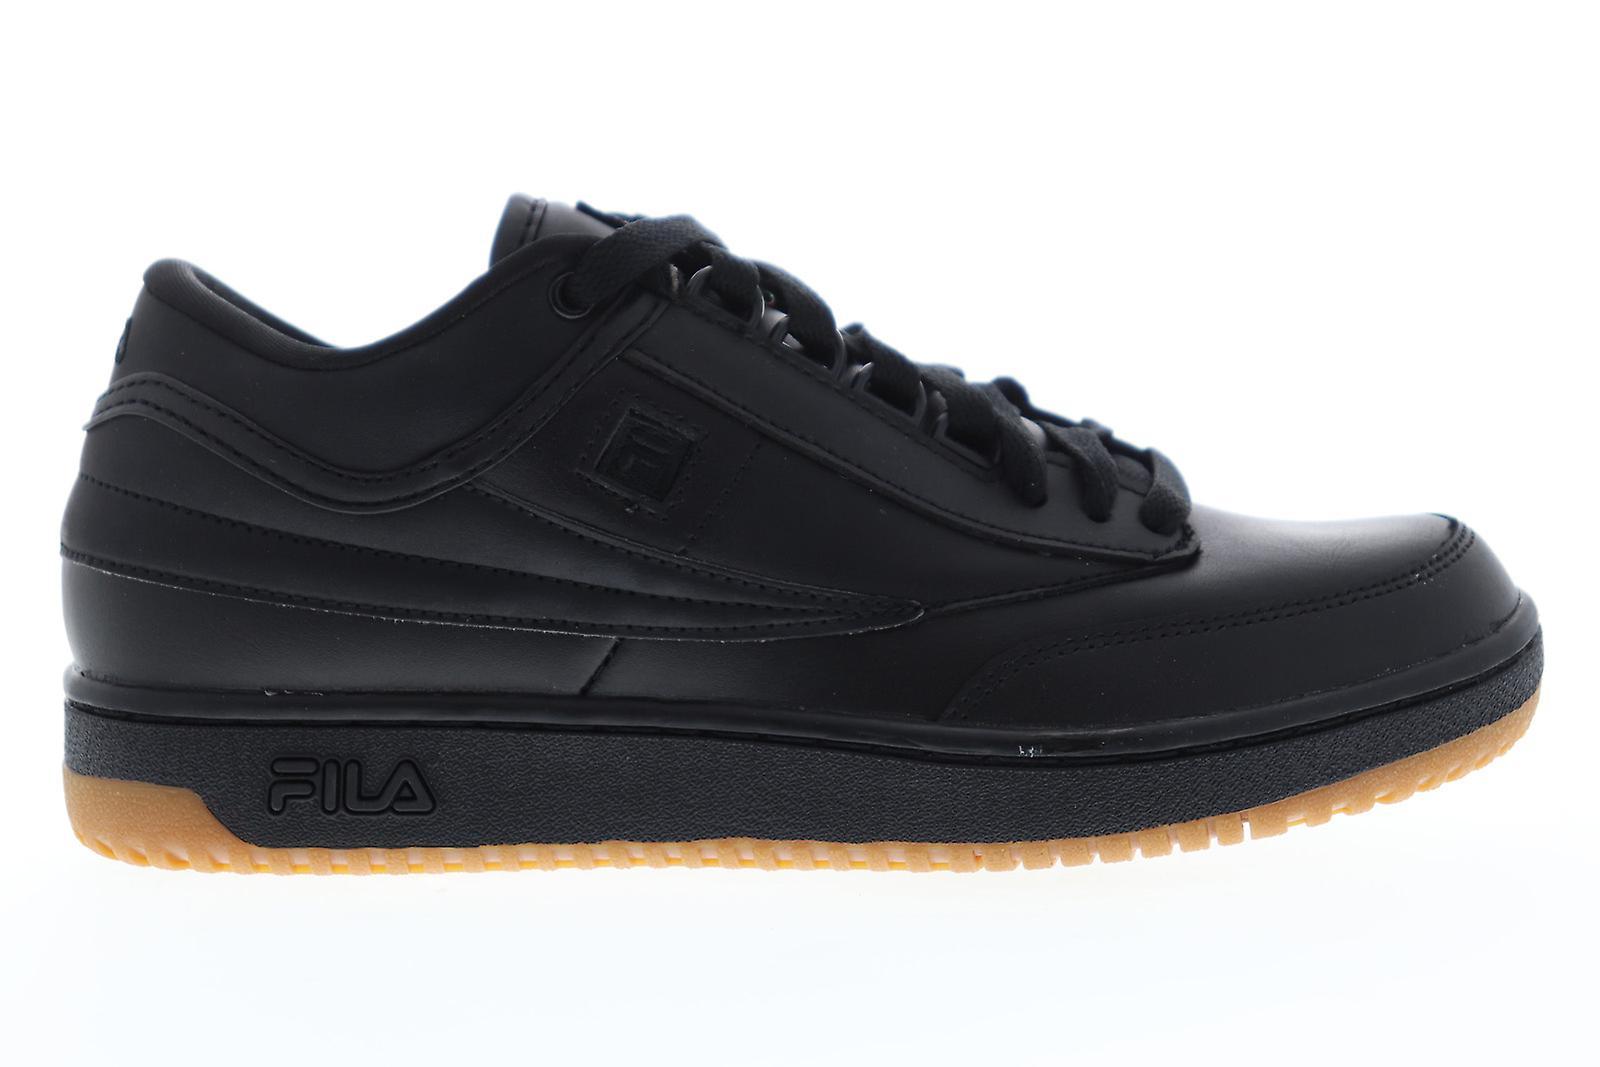 Fila T 1 mid glidelås menns svart casual lav topp joggesko sko